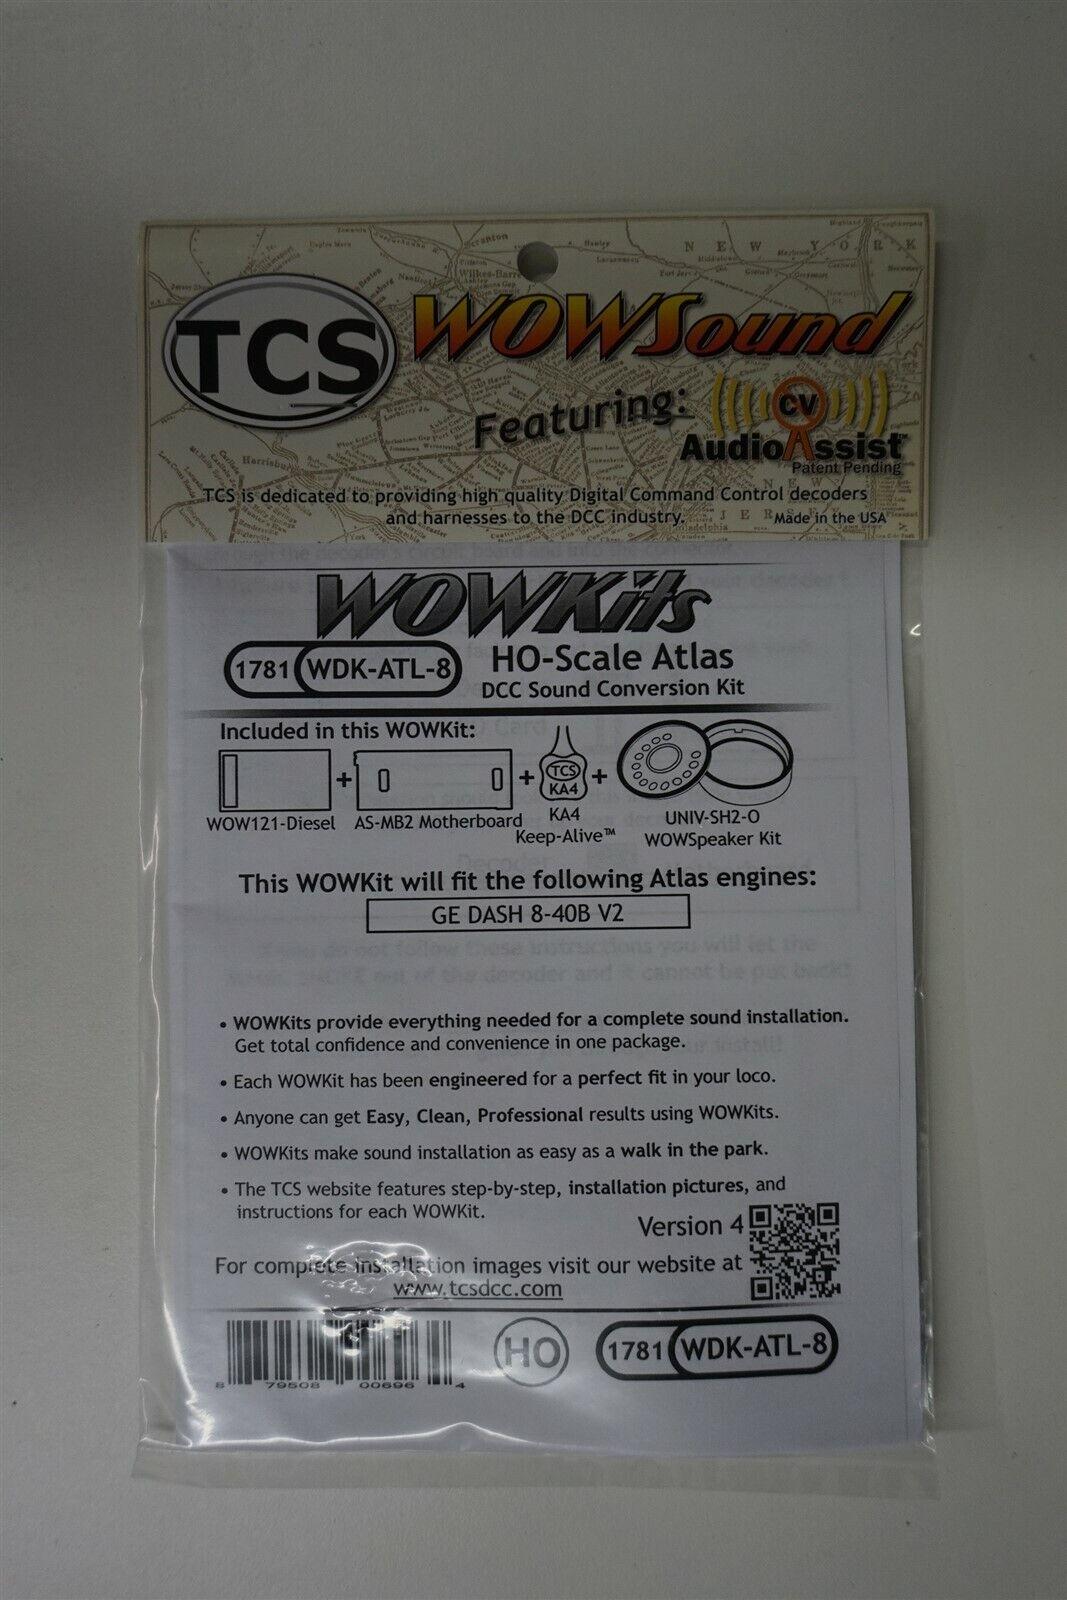 TCS {WOW WDKATL8} 1781 WOW DIESEL HO Scale ATLAS Version 4 nuovo YANKEEDABBLER